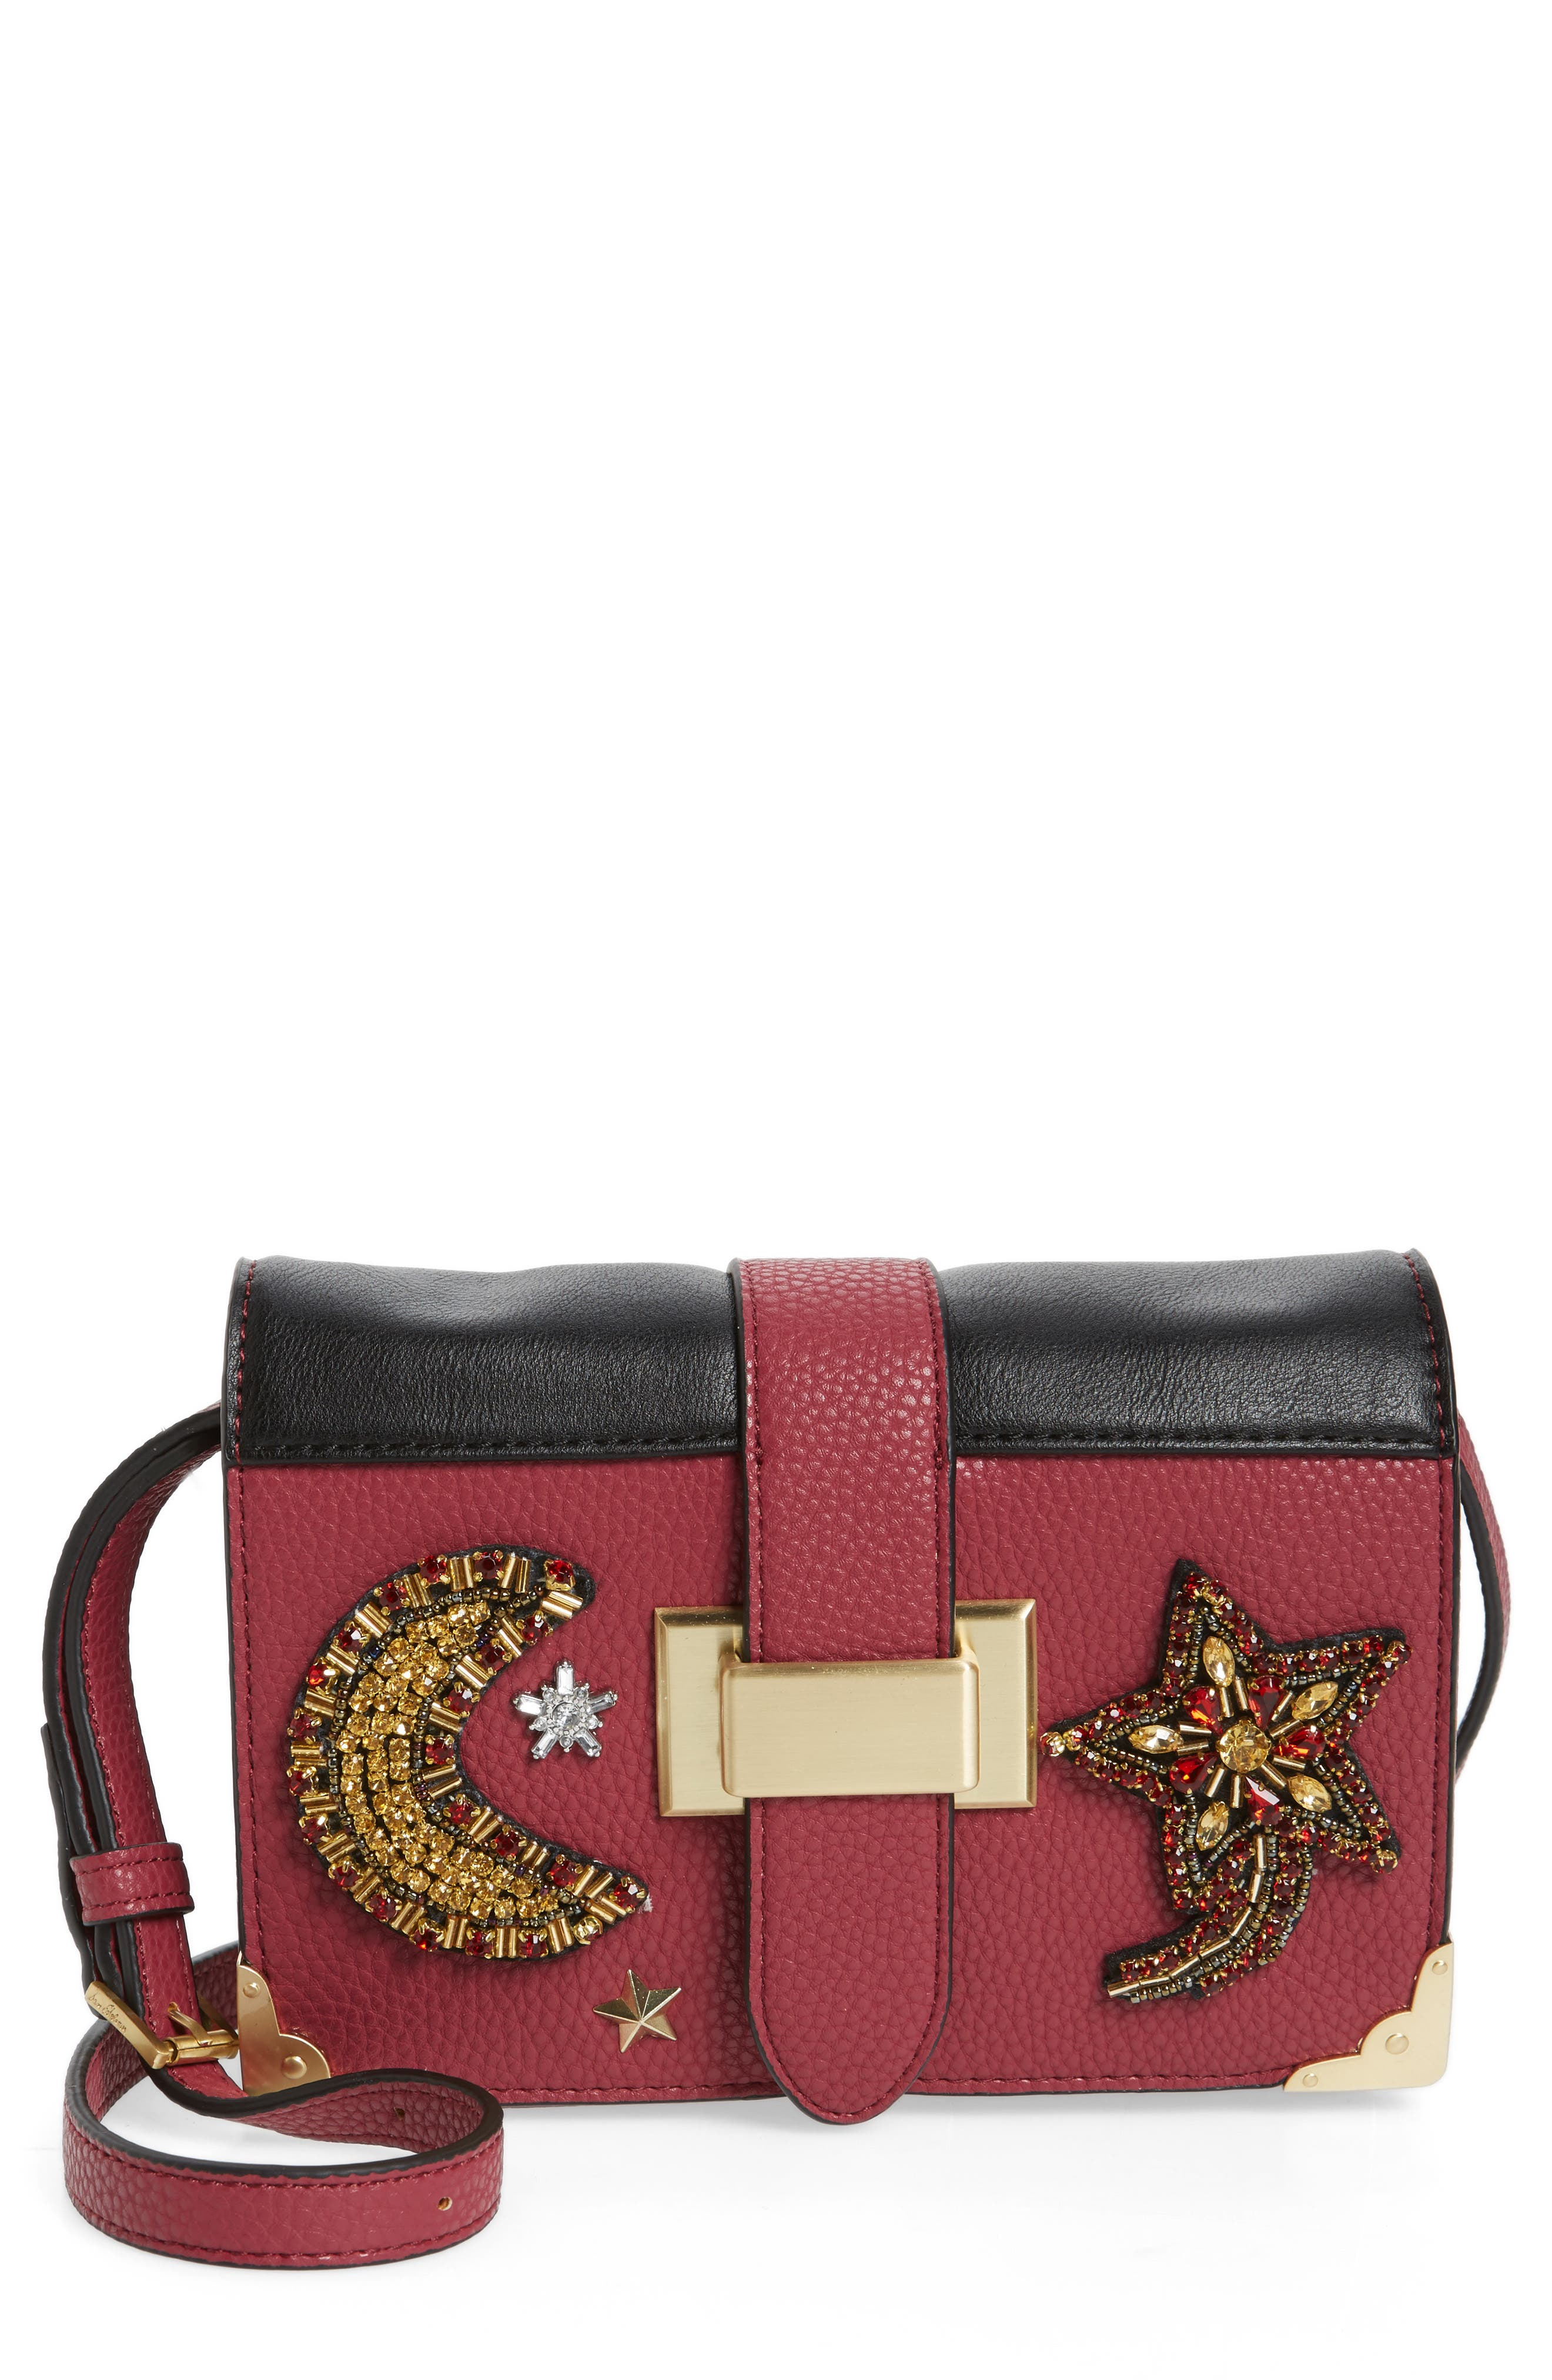 Florence Faux Leather Clutch Wallet,                         Main,                         color, Pink Garnet